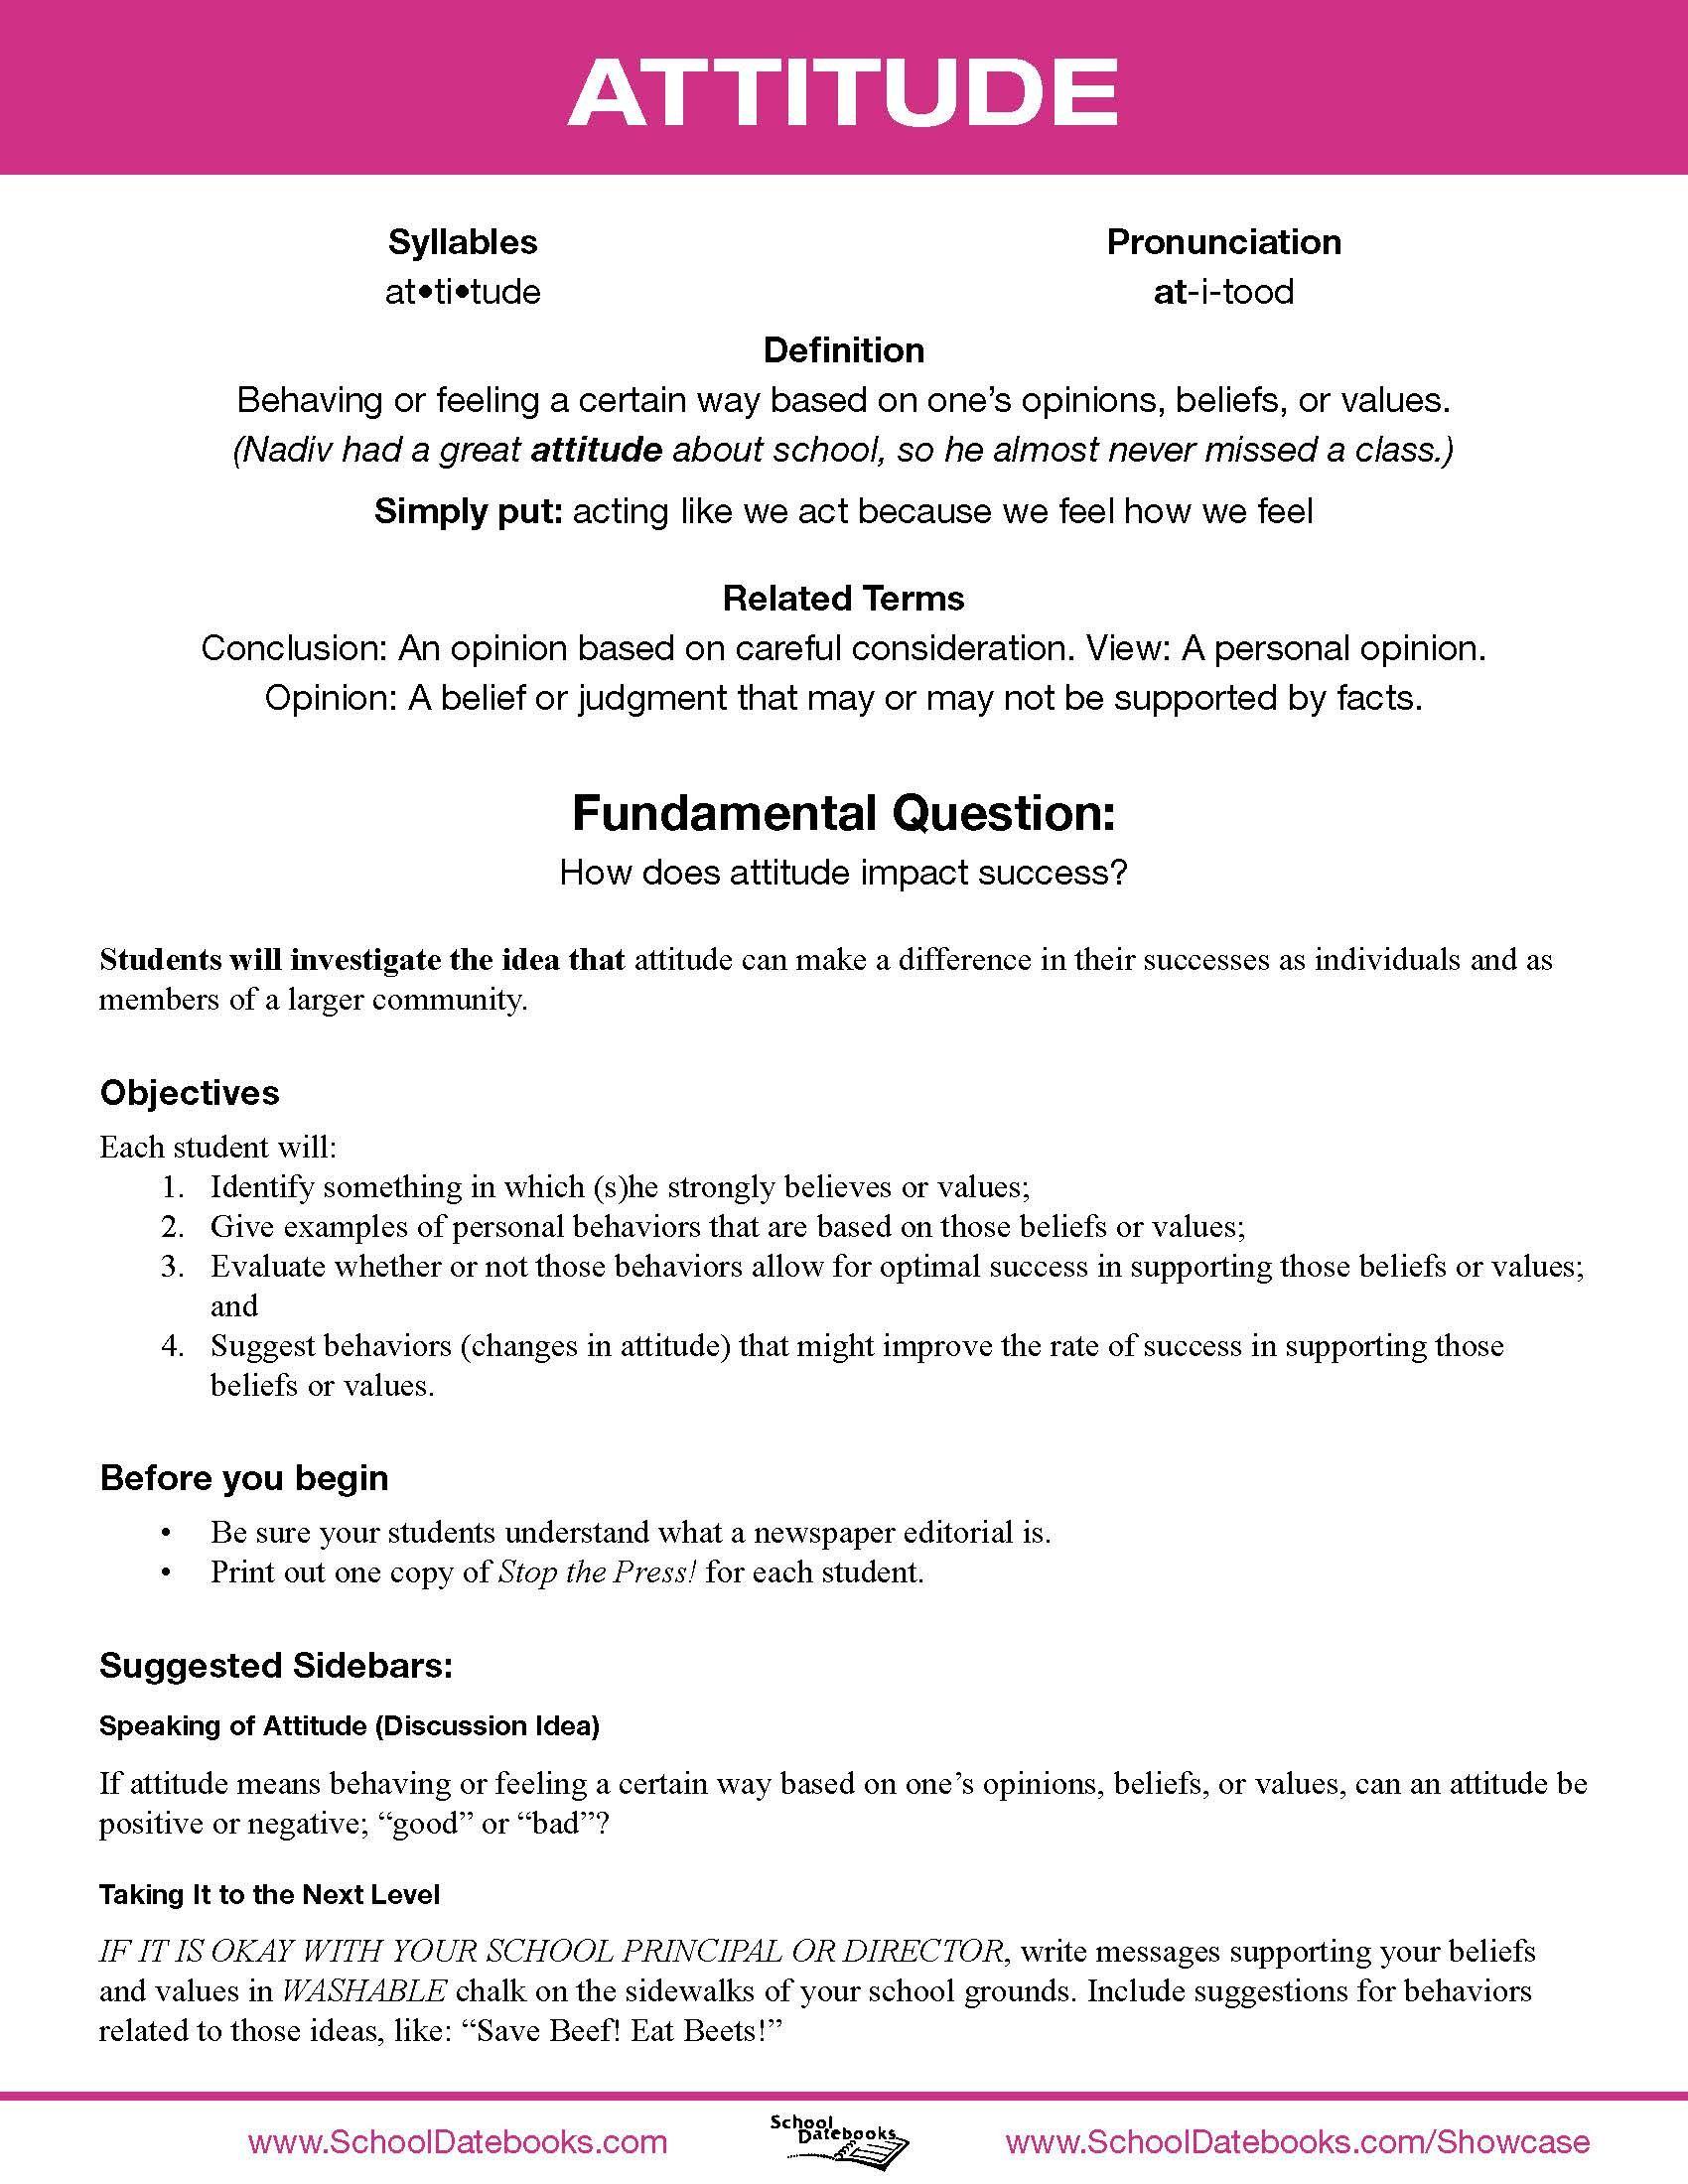 School Datebooks Character Education Lesson Plan Attitude